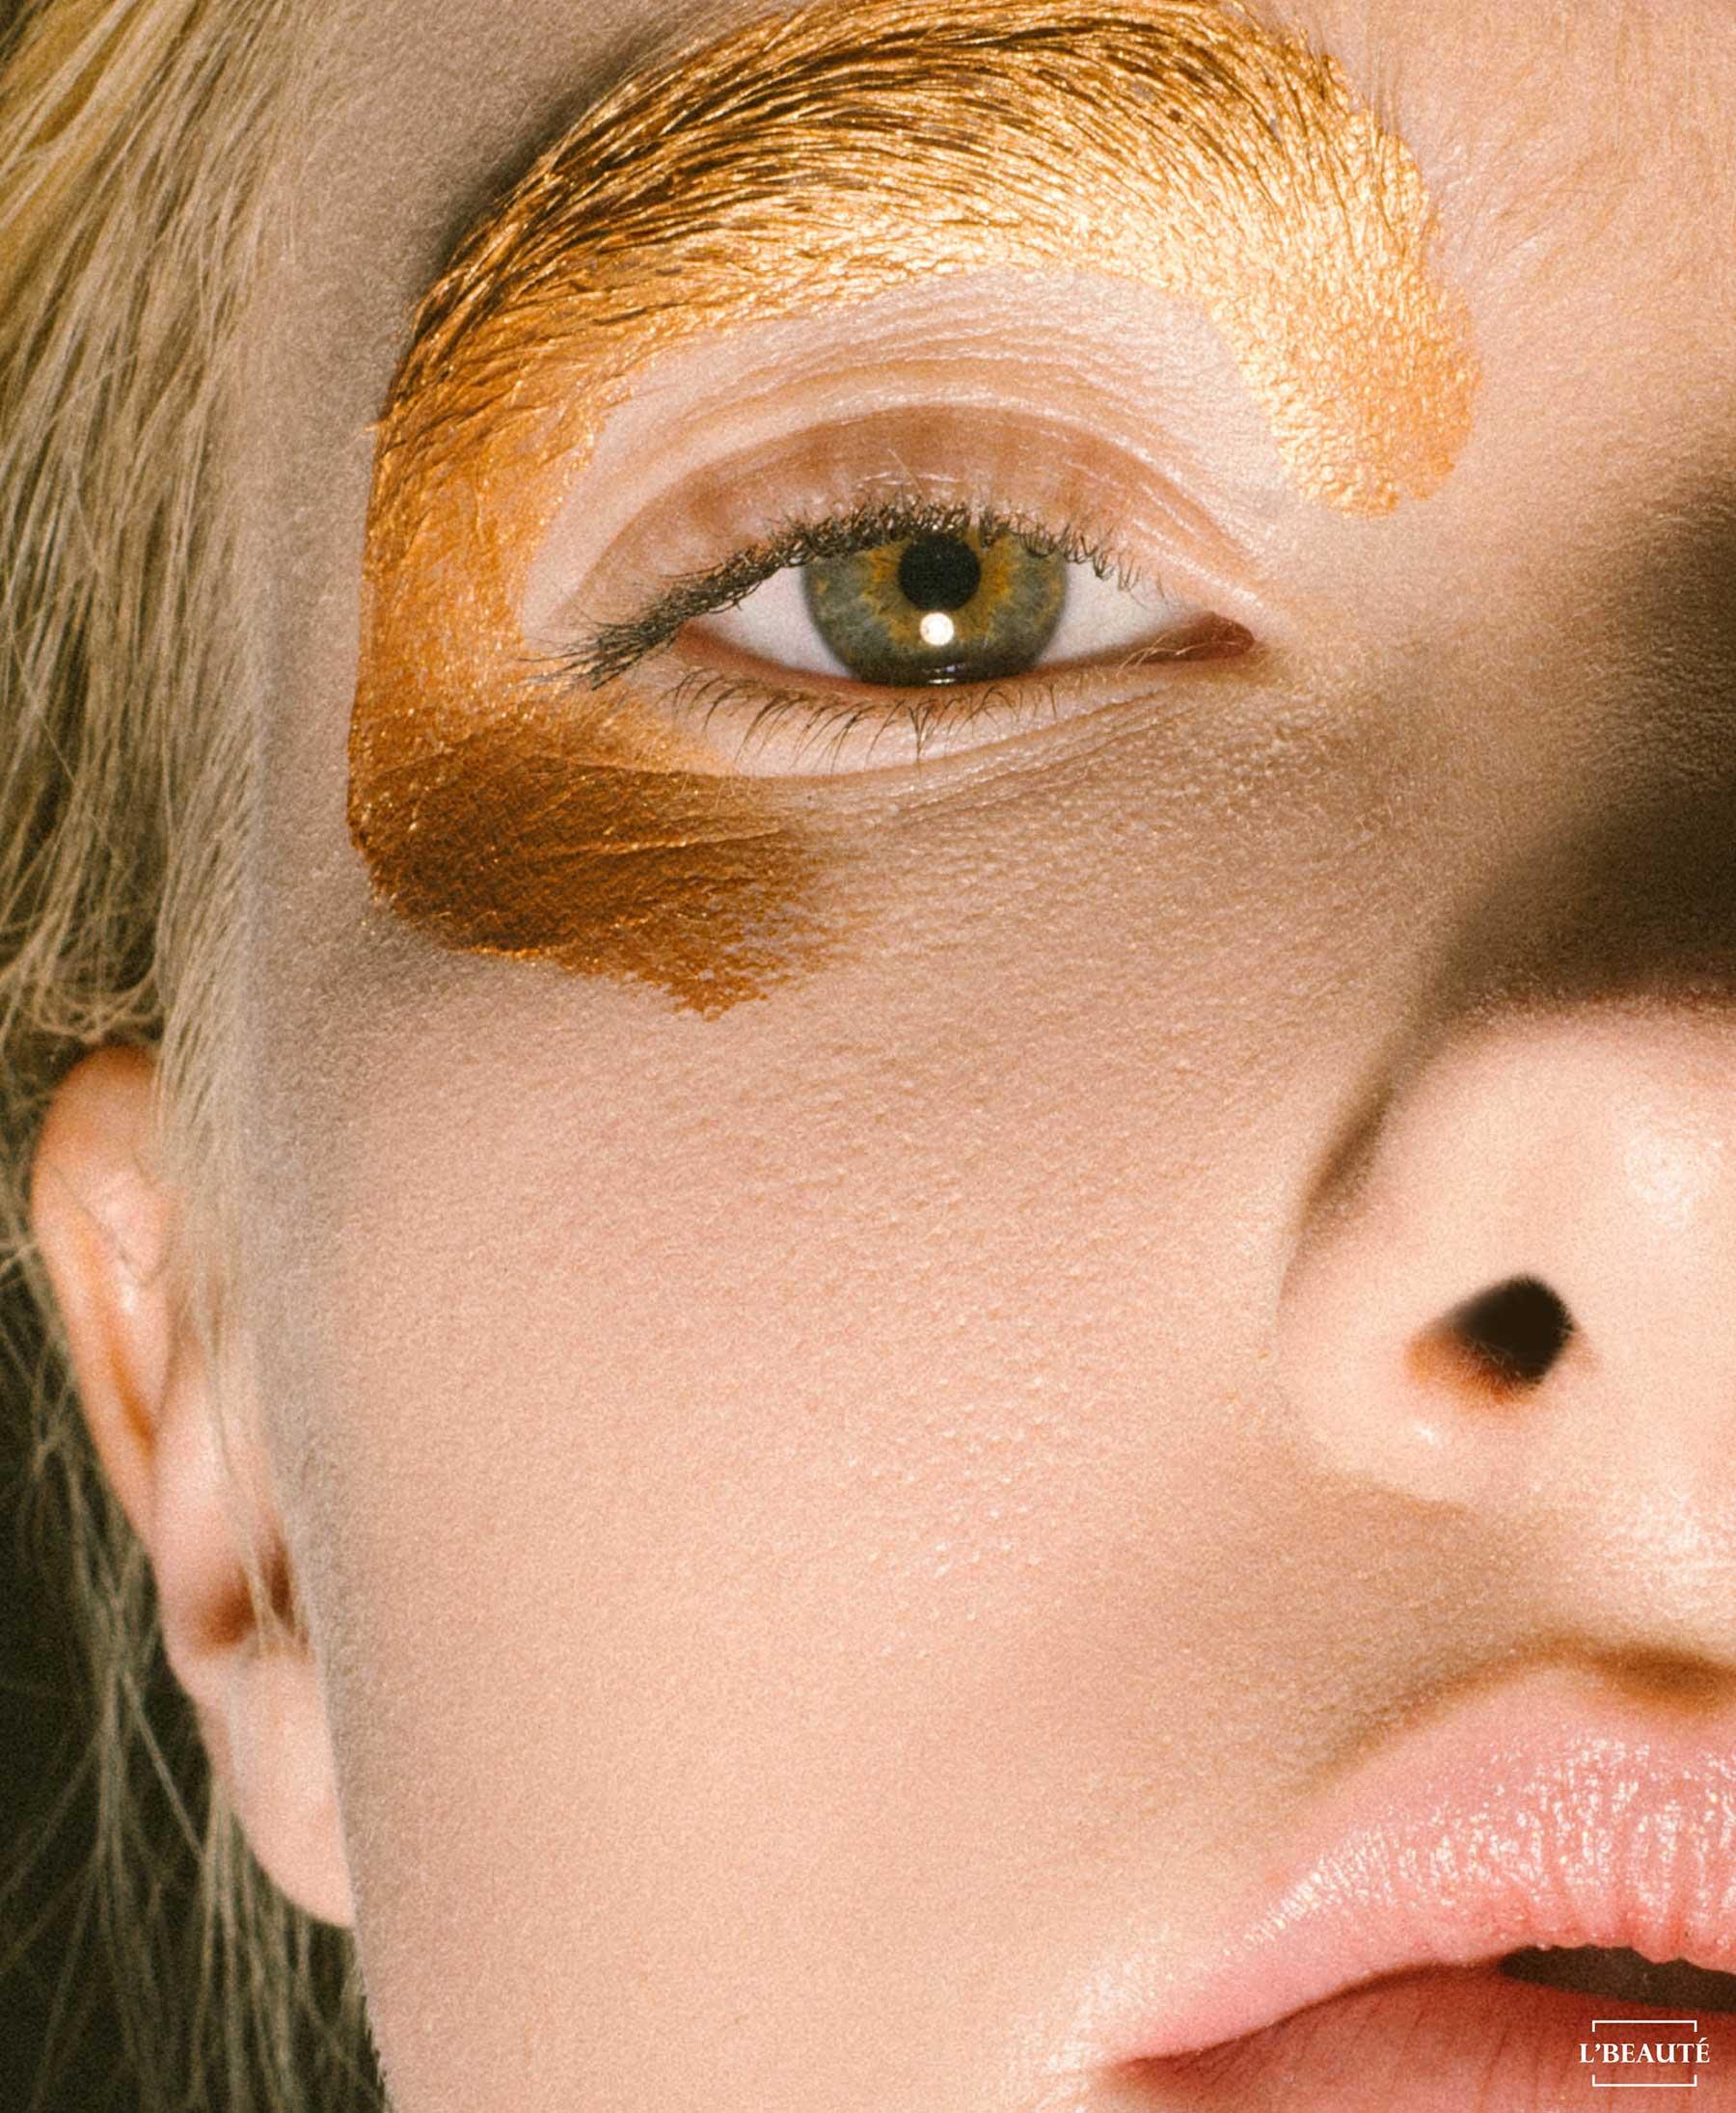 Beauty-Givenchy-Nicolas-Degennes15